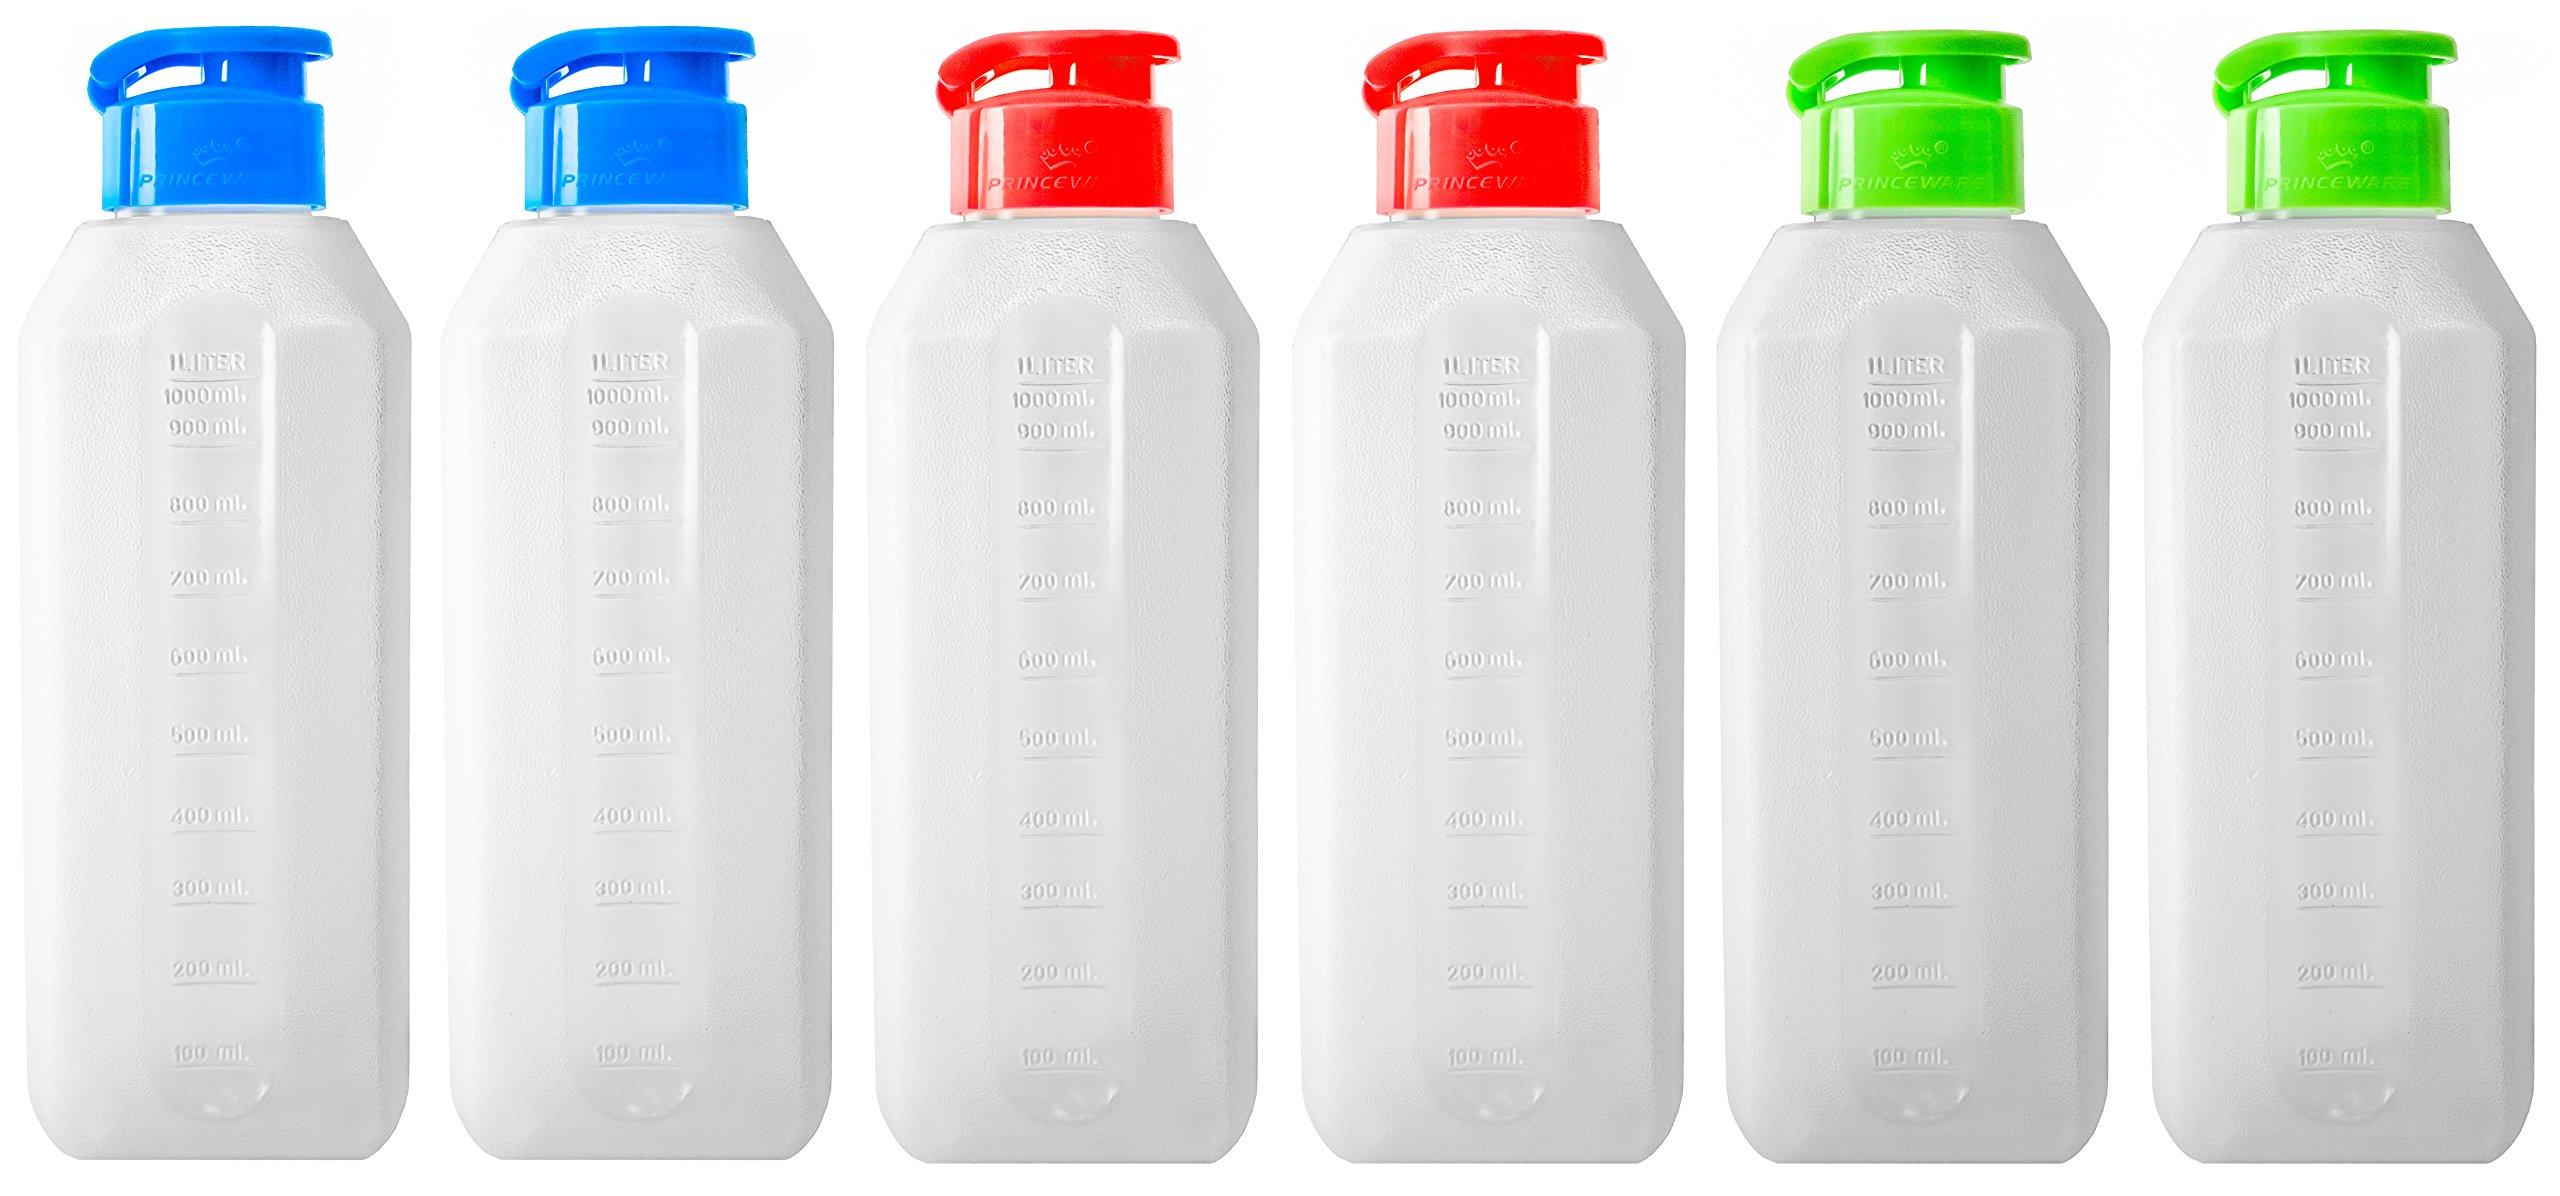 DecorRack 6 Pack Plastic Beverage Bottles, Water Sport Drinks Dressing, Measuring Mixing, Storage Container, Easy One Click Flip Screw Cap, Reusable, Leakproof, 35 oz –BPA Free– Random Colors (6 Pack)